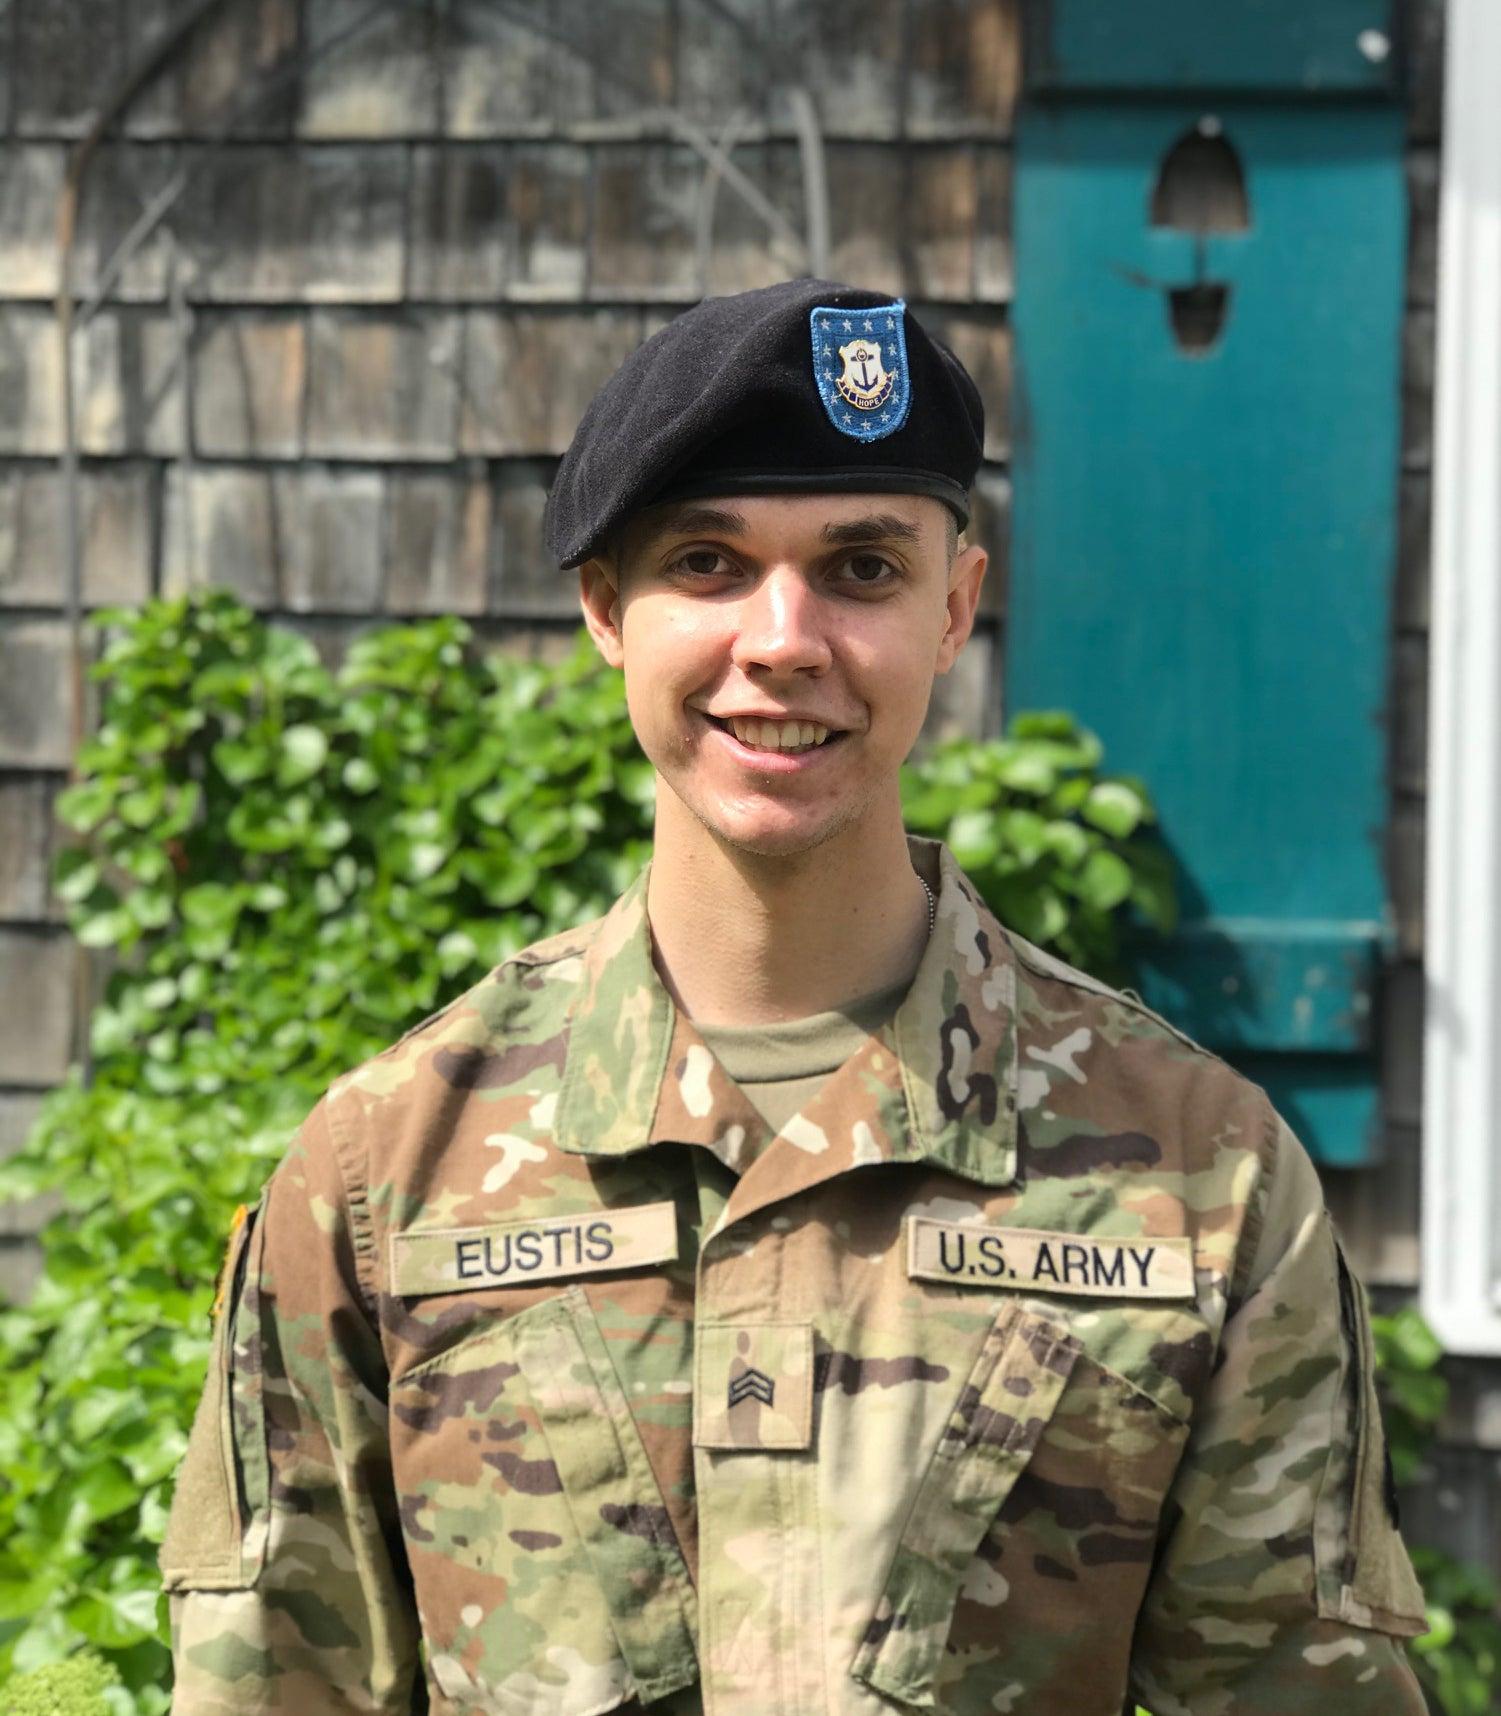 ROTC cadet Jack Eustis